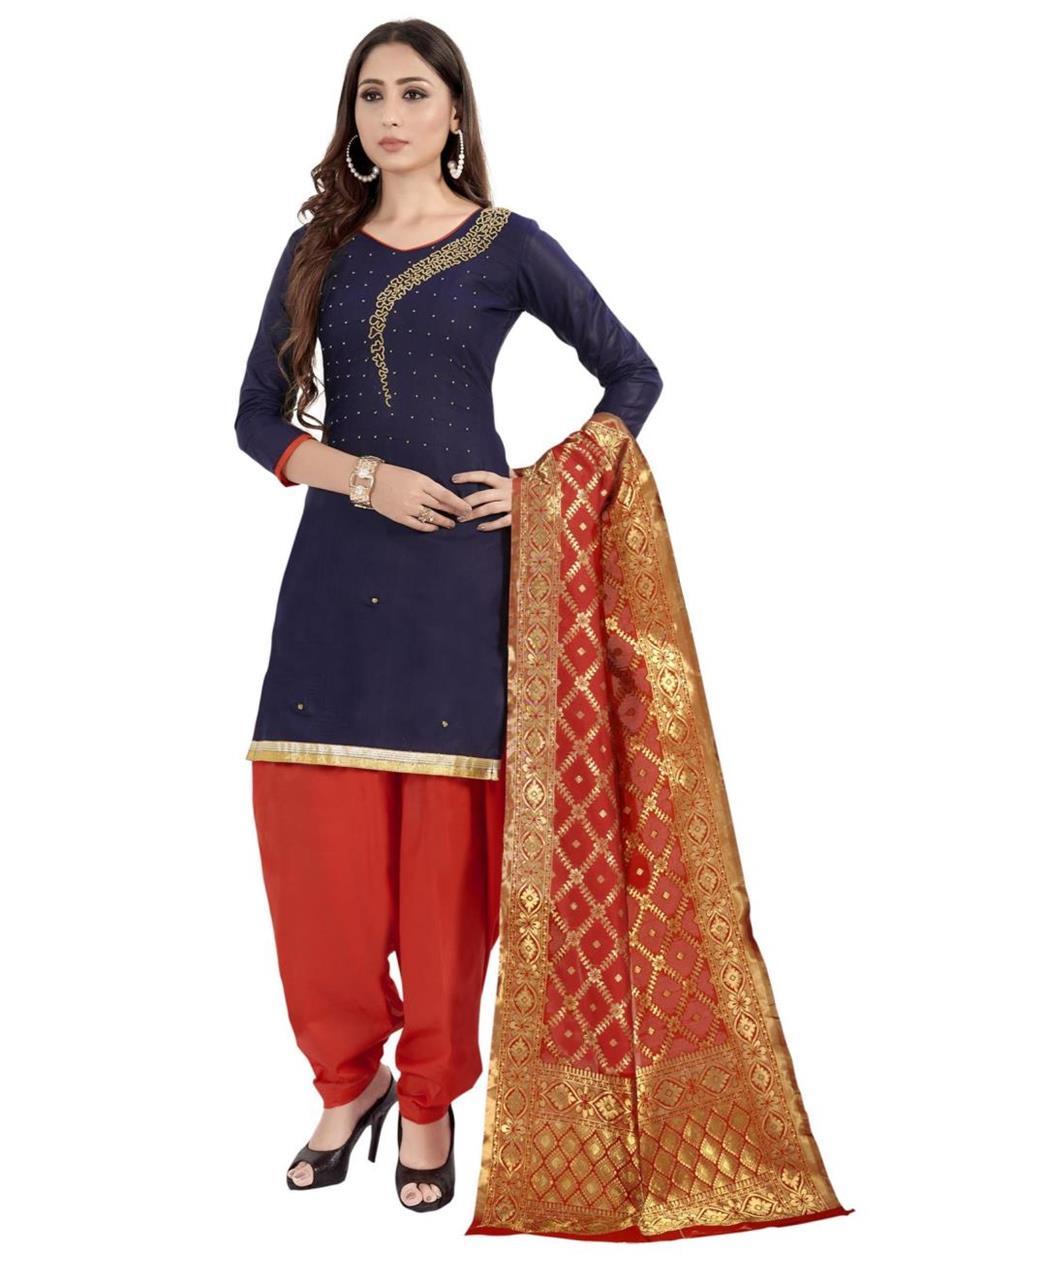 HandWorked Cotton Patiyala Suit Salwar in Navy Blue